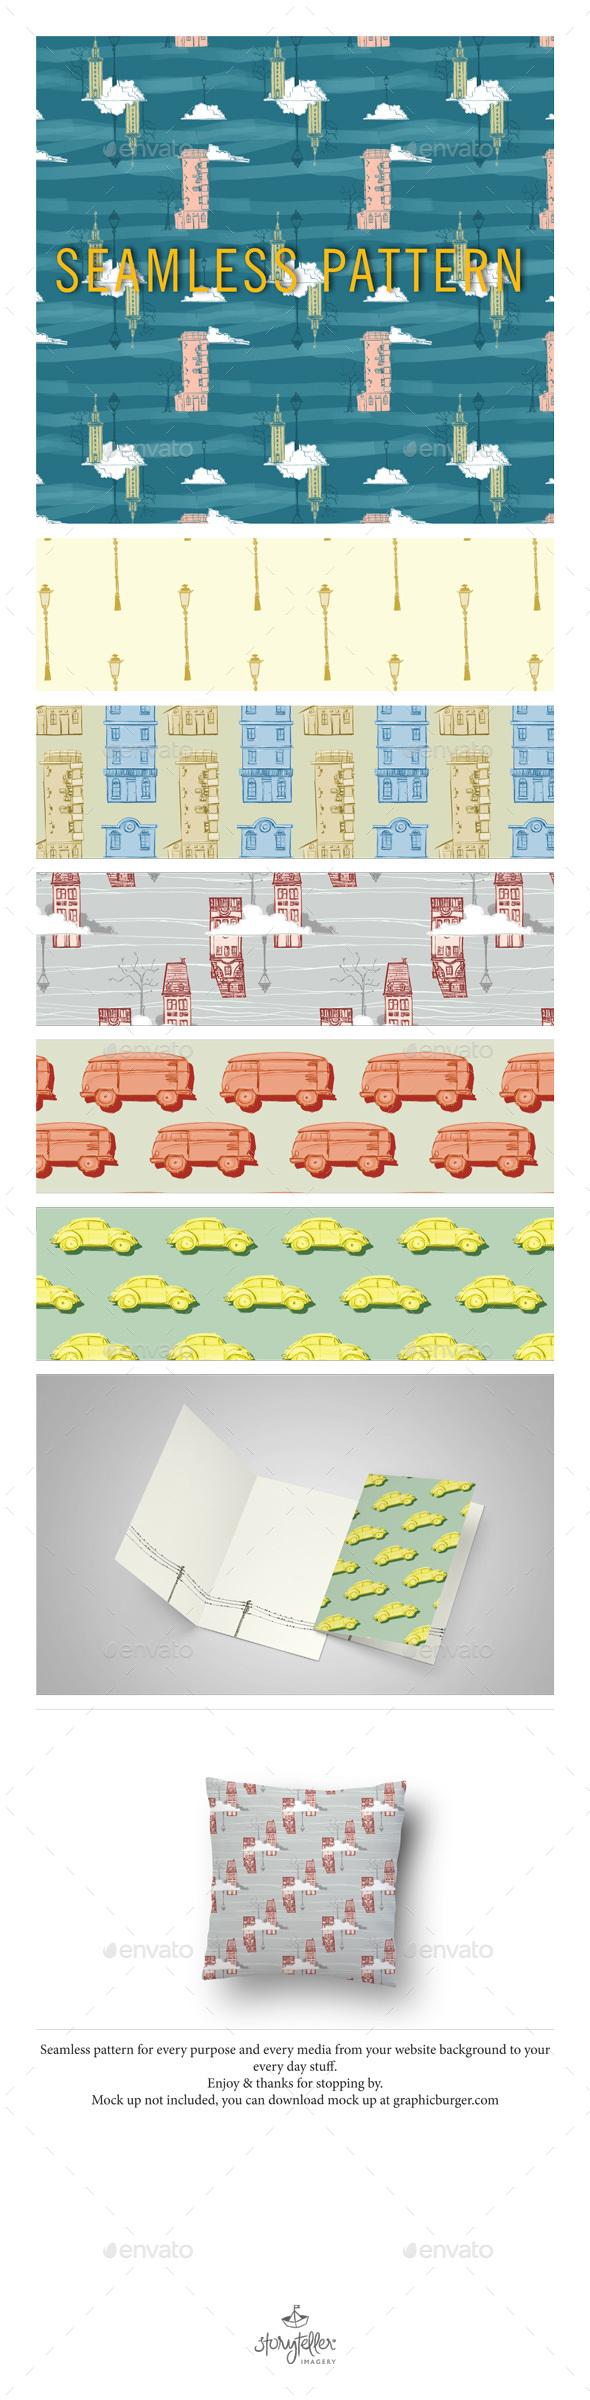 Seamless Pattern - Patterns Backgrounds